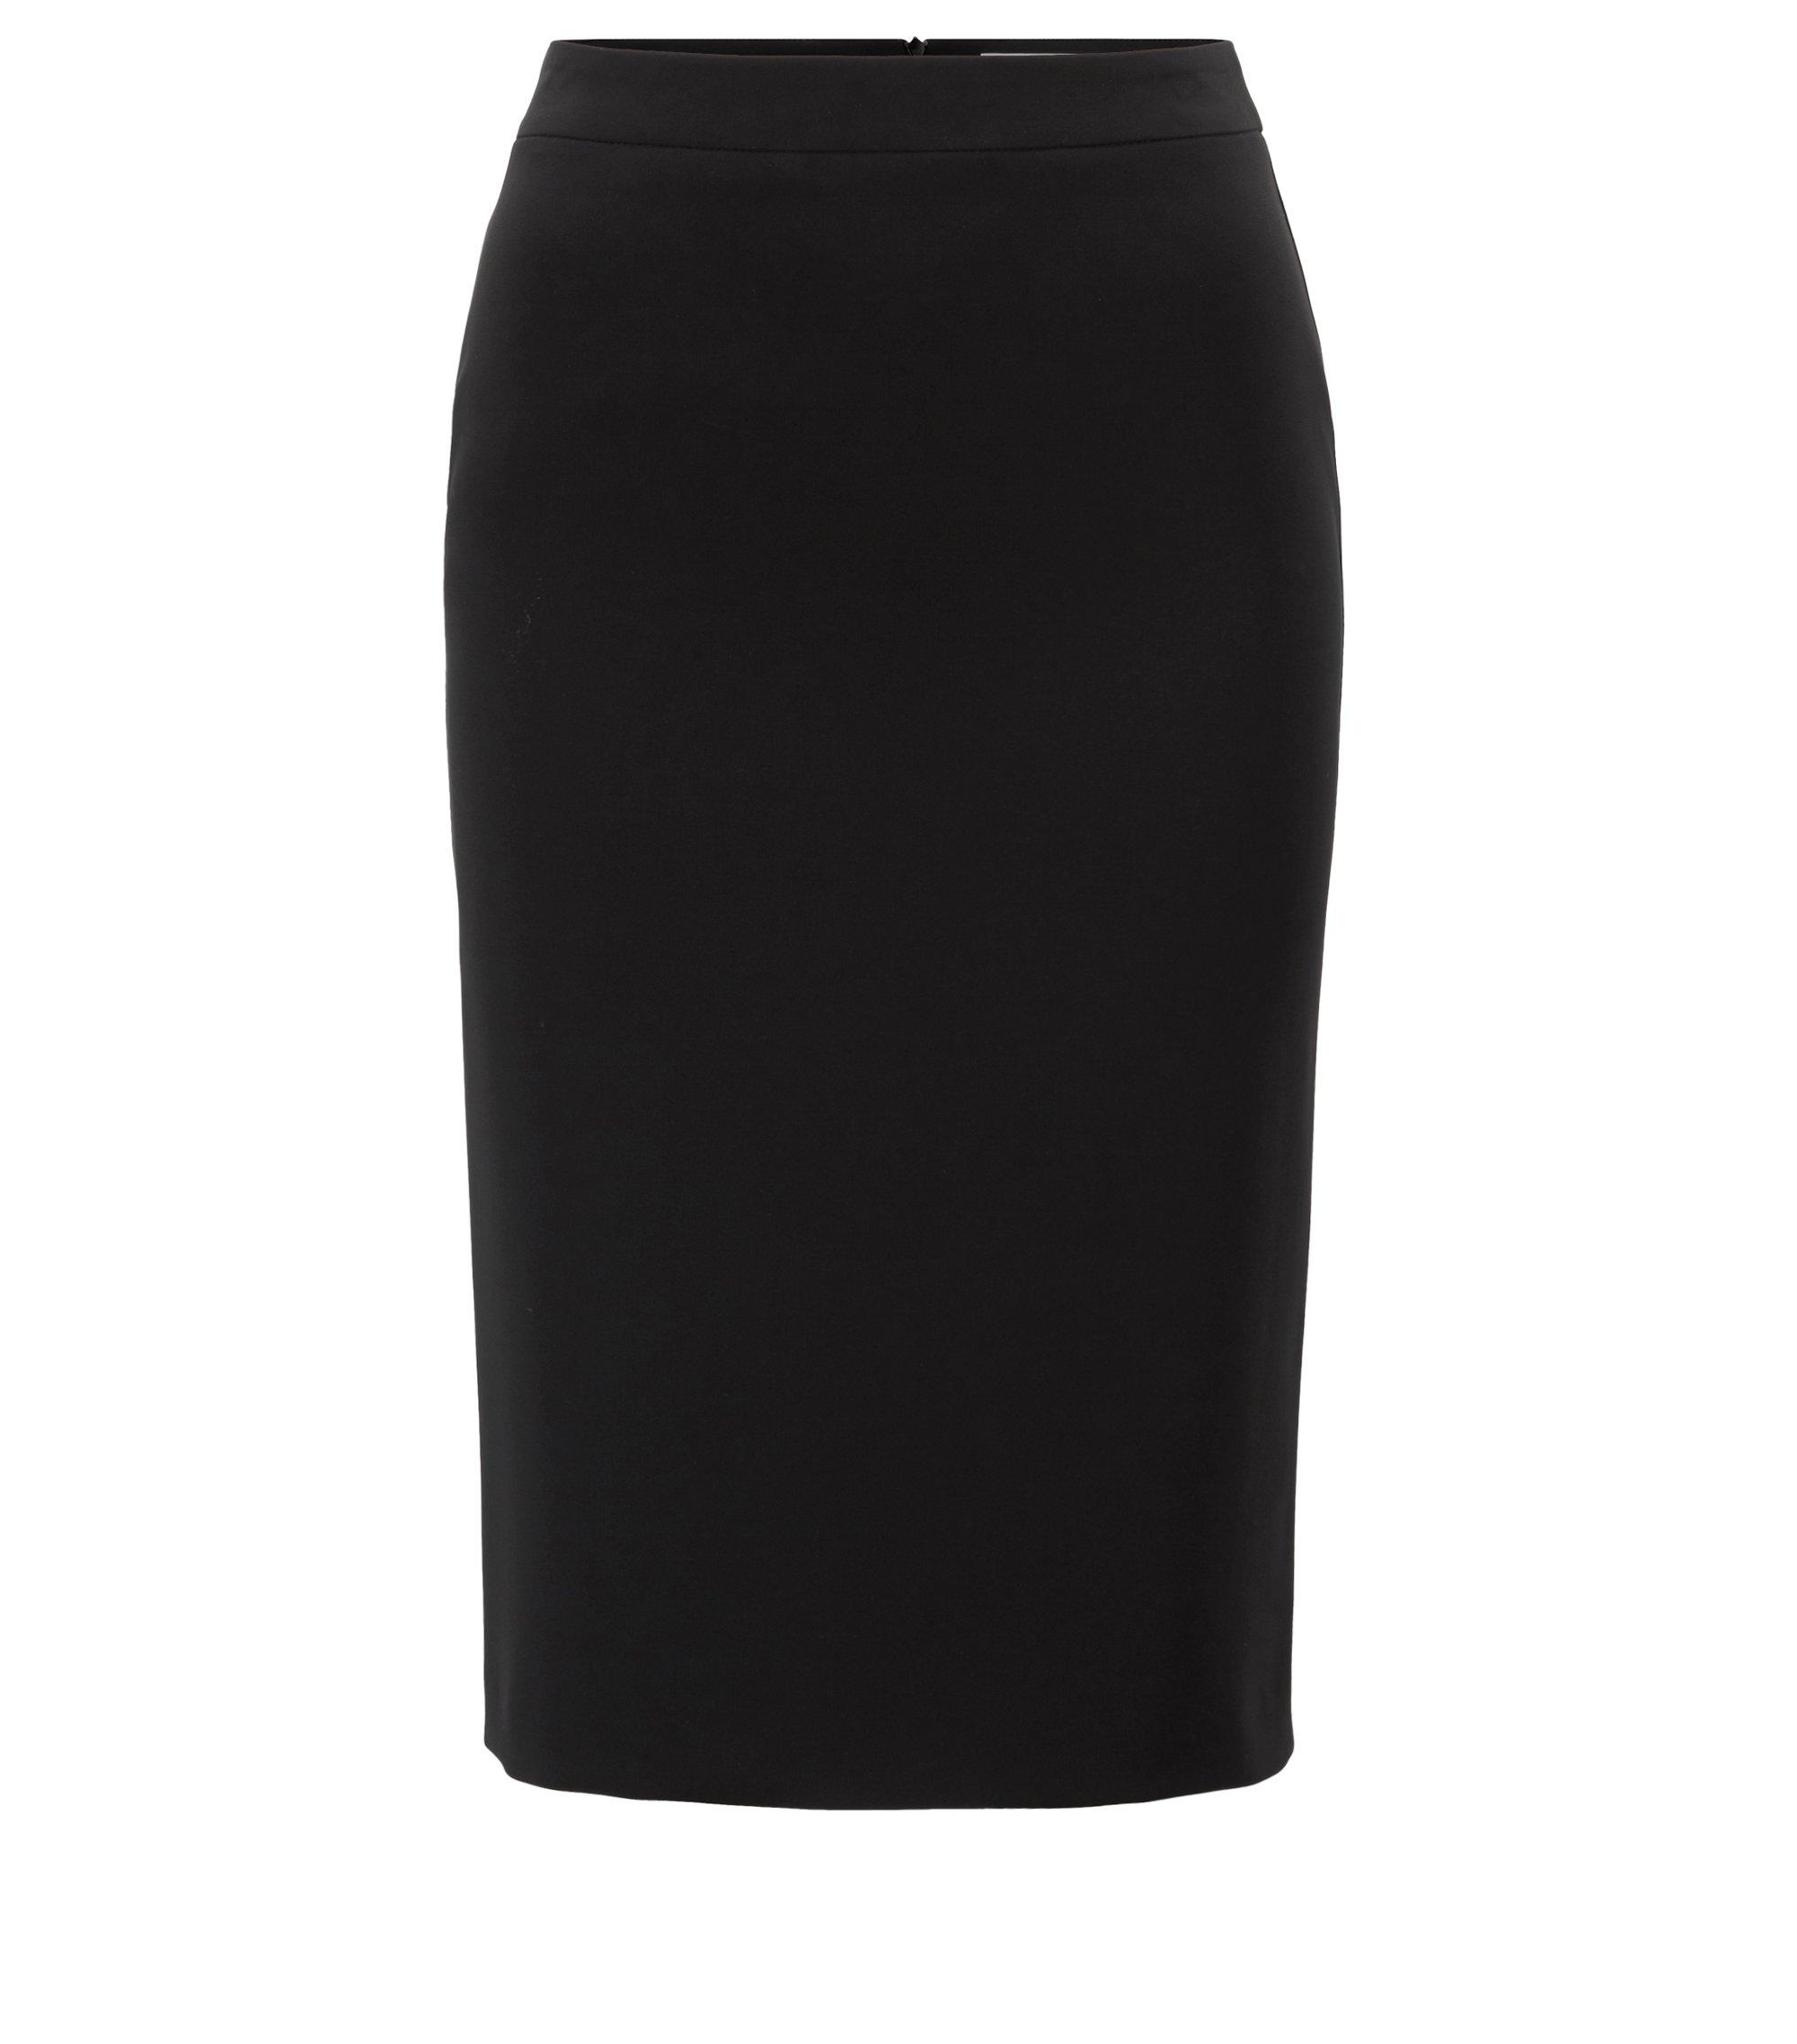 Pencil skirt in crease-resistant Japanese crepe, Zwart